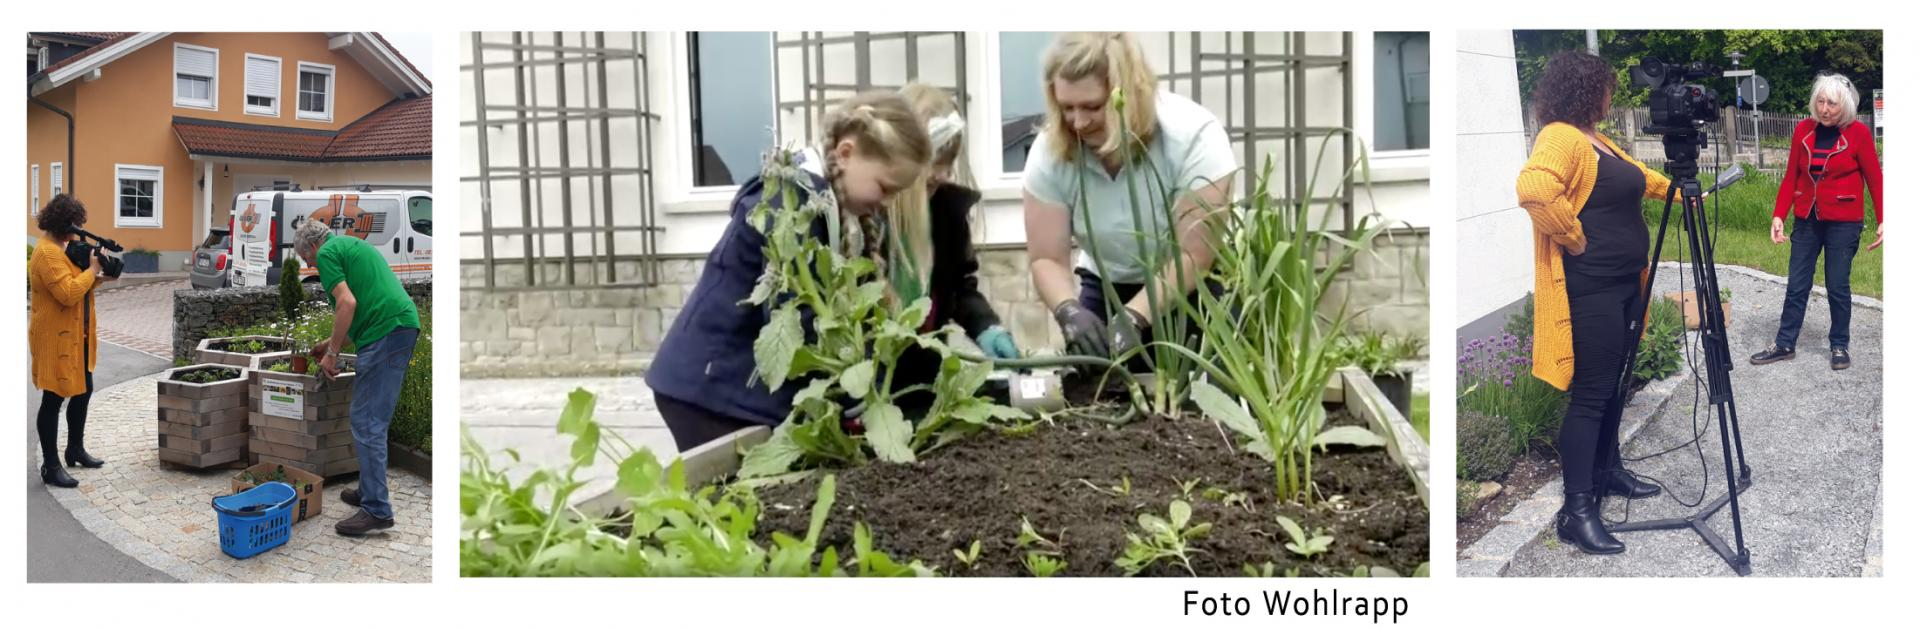 bepflanzen-beete_07-2021